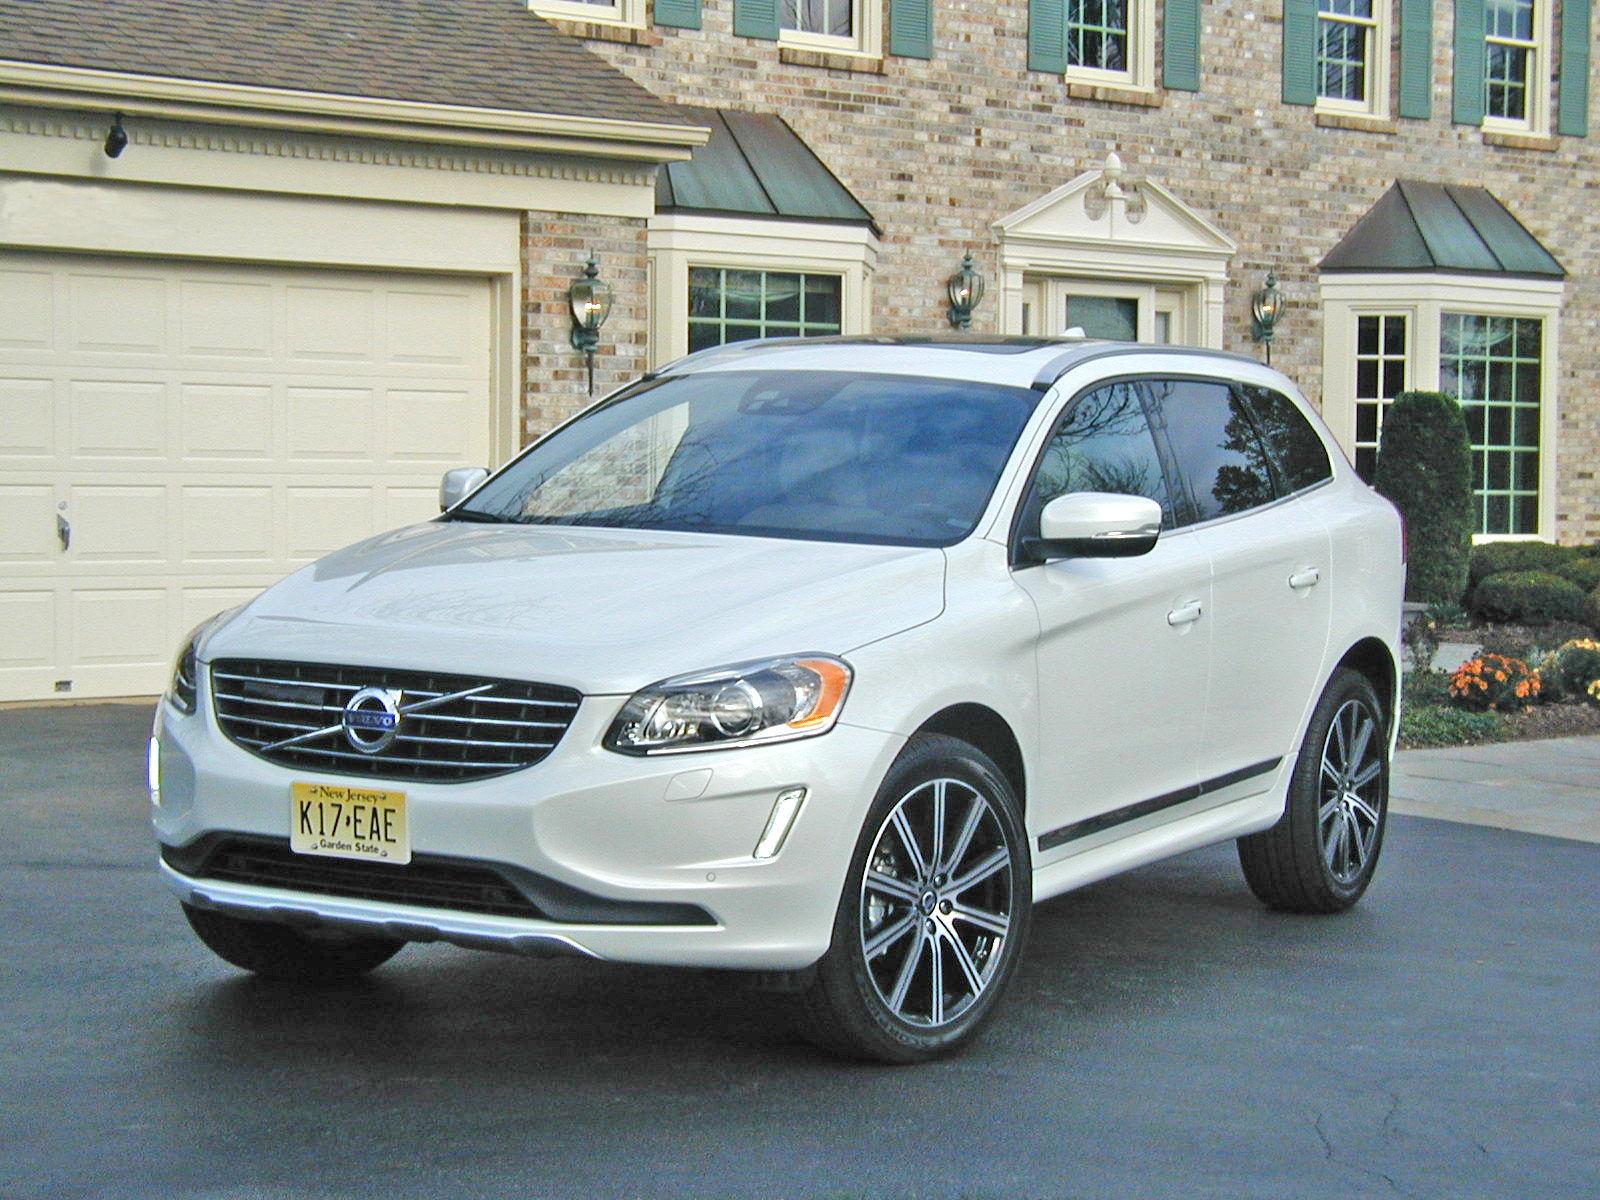 2015 Volvo XC60: Crossover Heralds Driving Efficiency